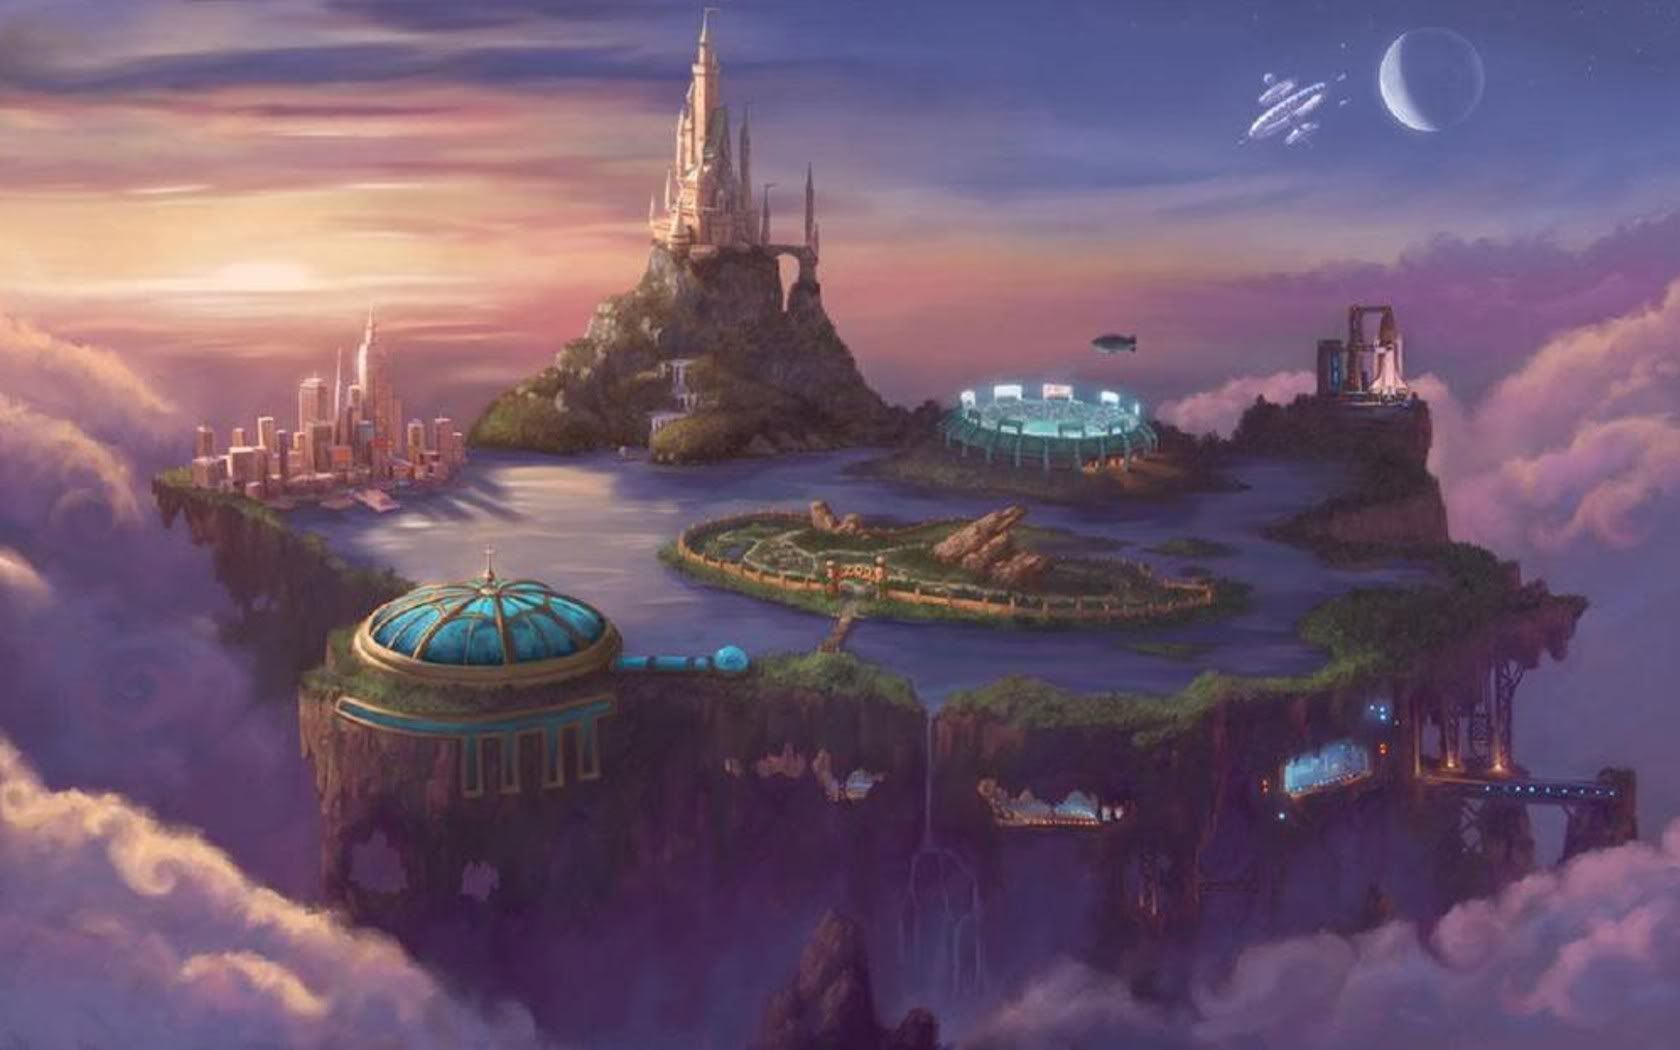 Pin By Thea Huffman On R Tripp S Fav Chrono Art Fantasy City Fantasy Landscape Castle Art